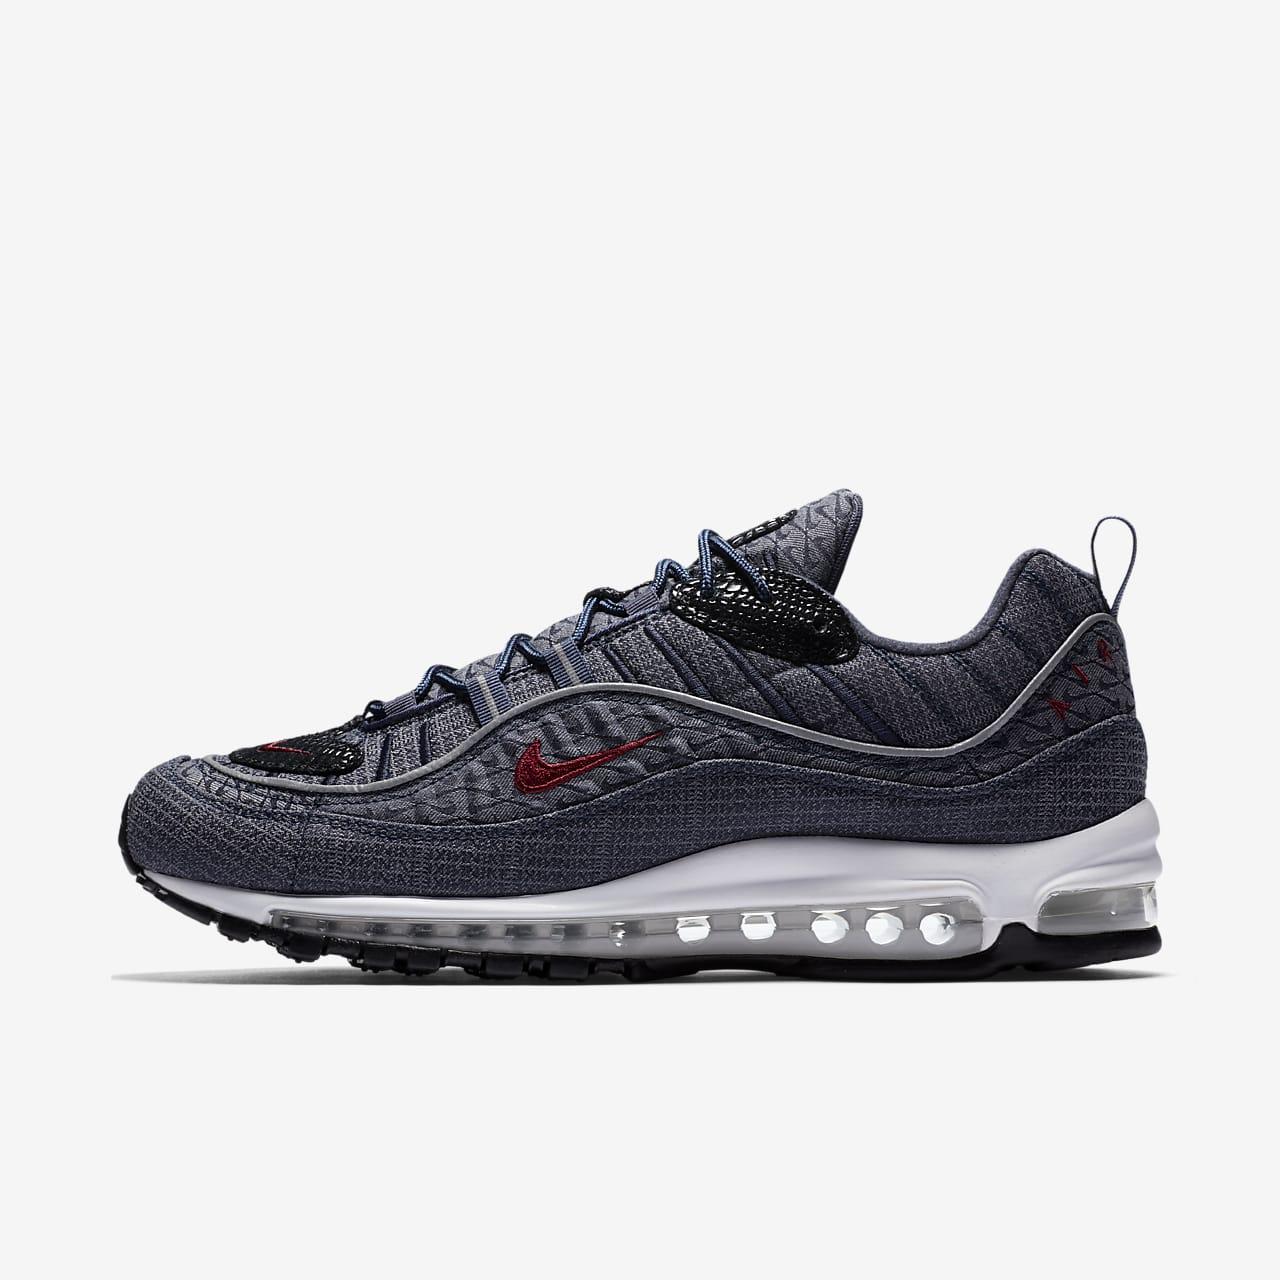 Nike Air Max 98 QS Men's Shoe